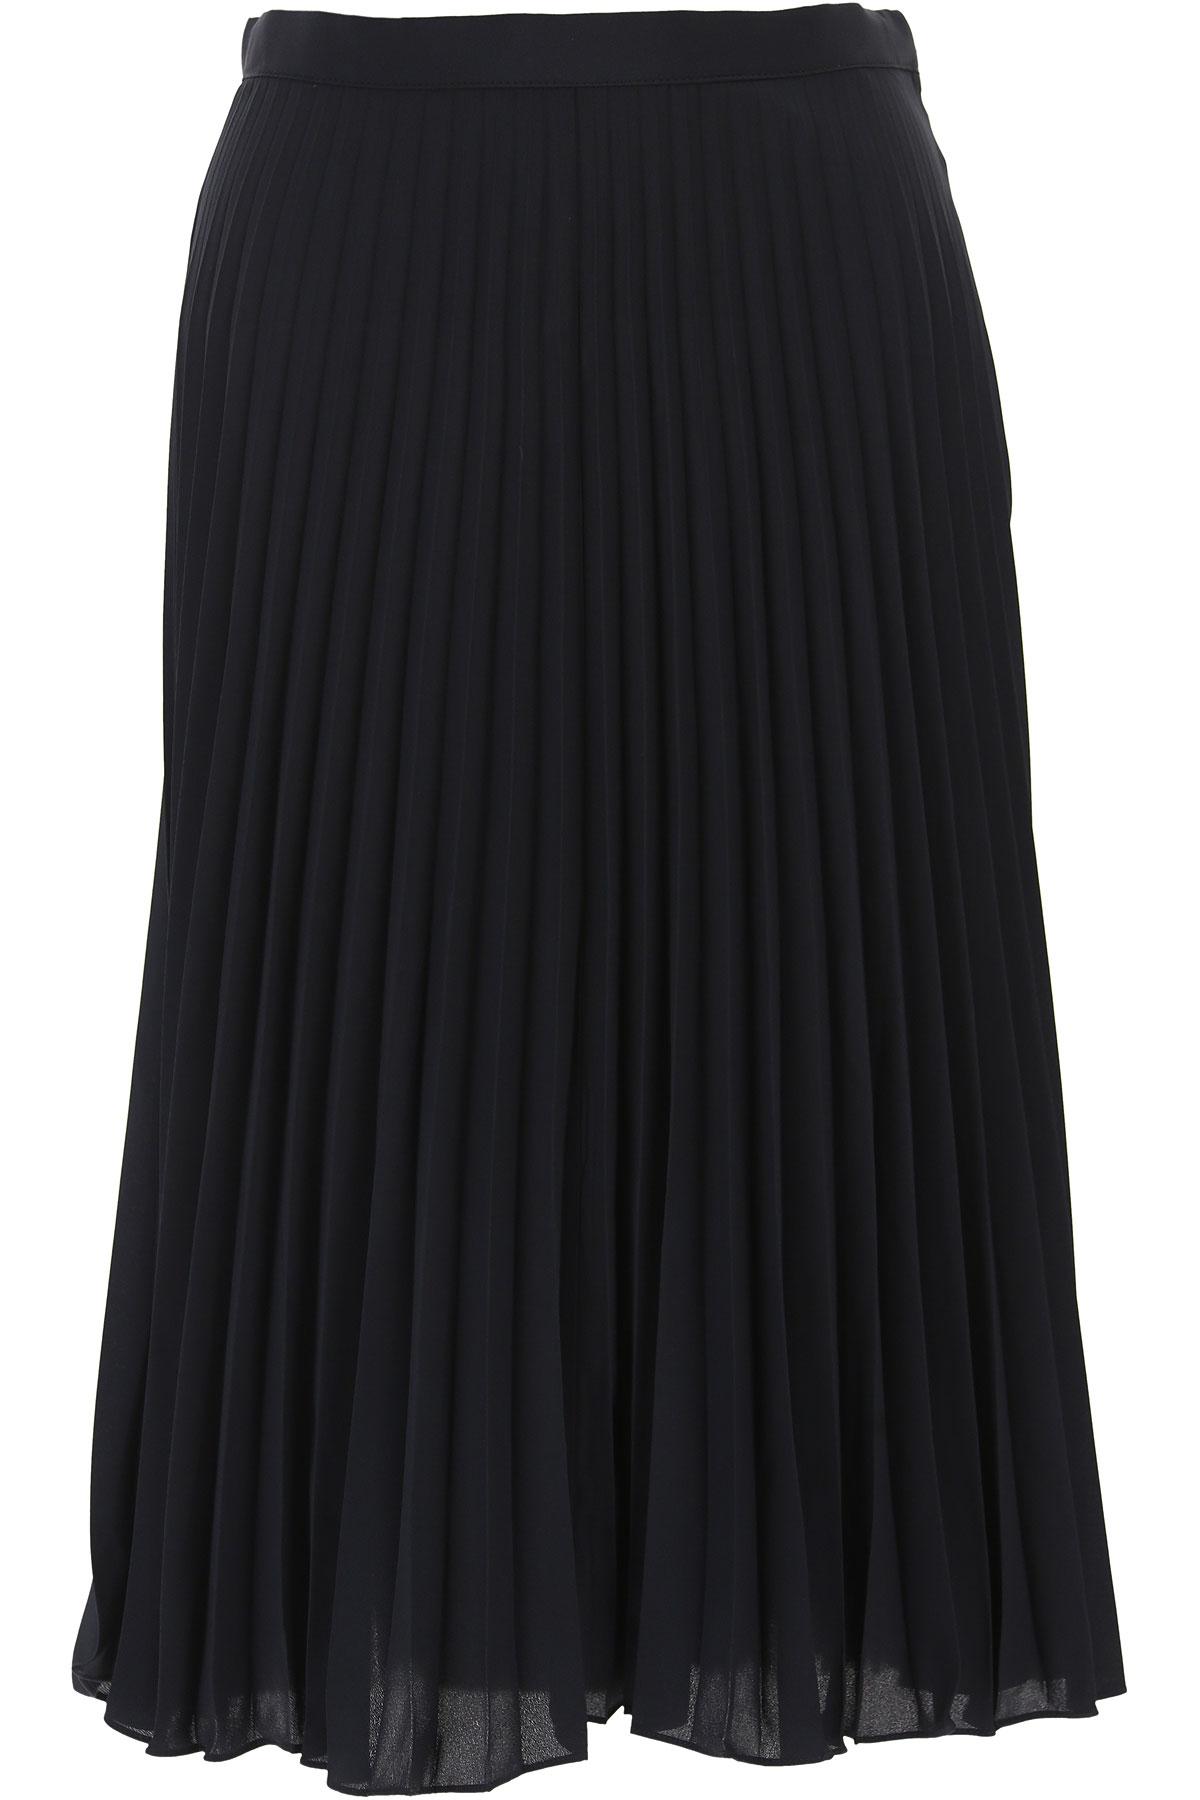 Michael Kors Skirt for Women On Sale in Outlet, navy, polyester, 2019, IT 42 - US 4 - F 38 IT 44 - US 6 - F 40 IT 46 - US 8 - F 42 IT 48 - US 10 - F 4